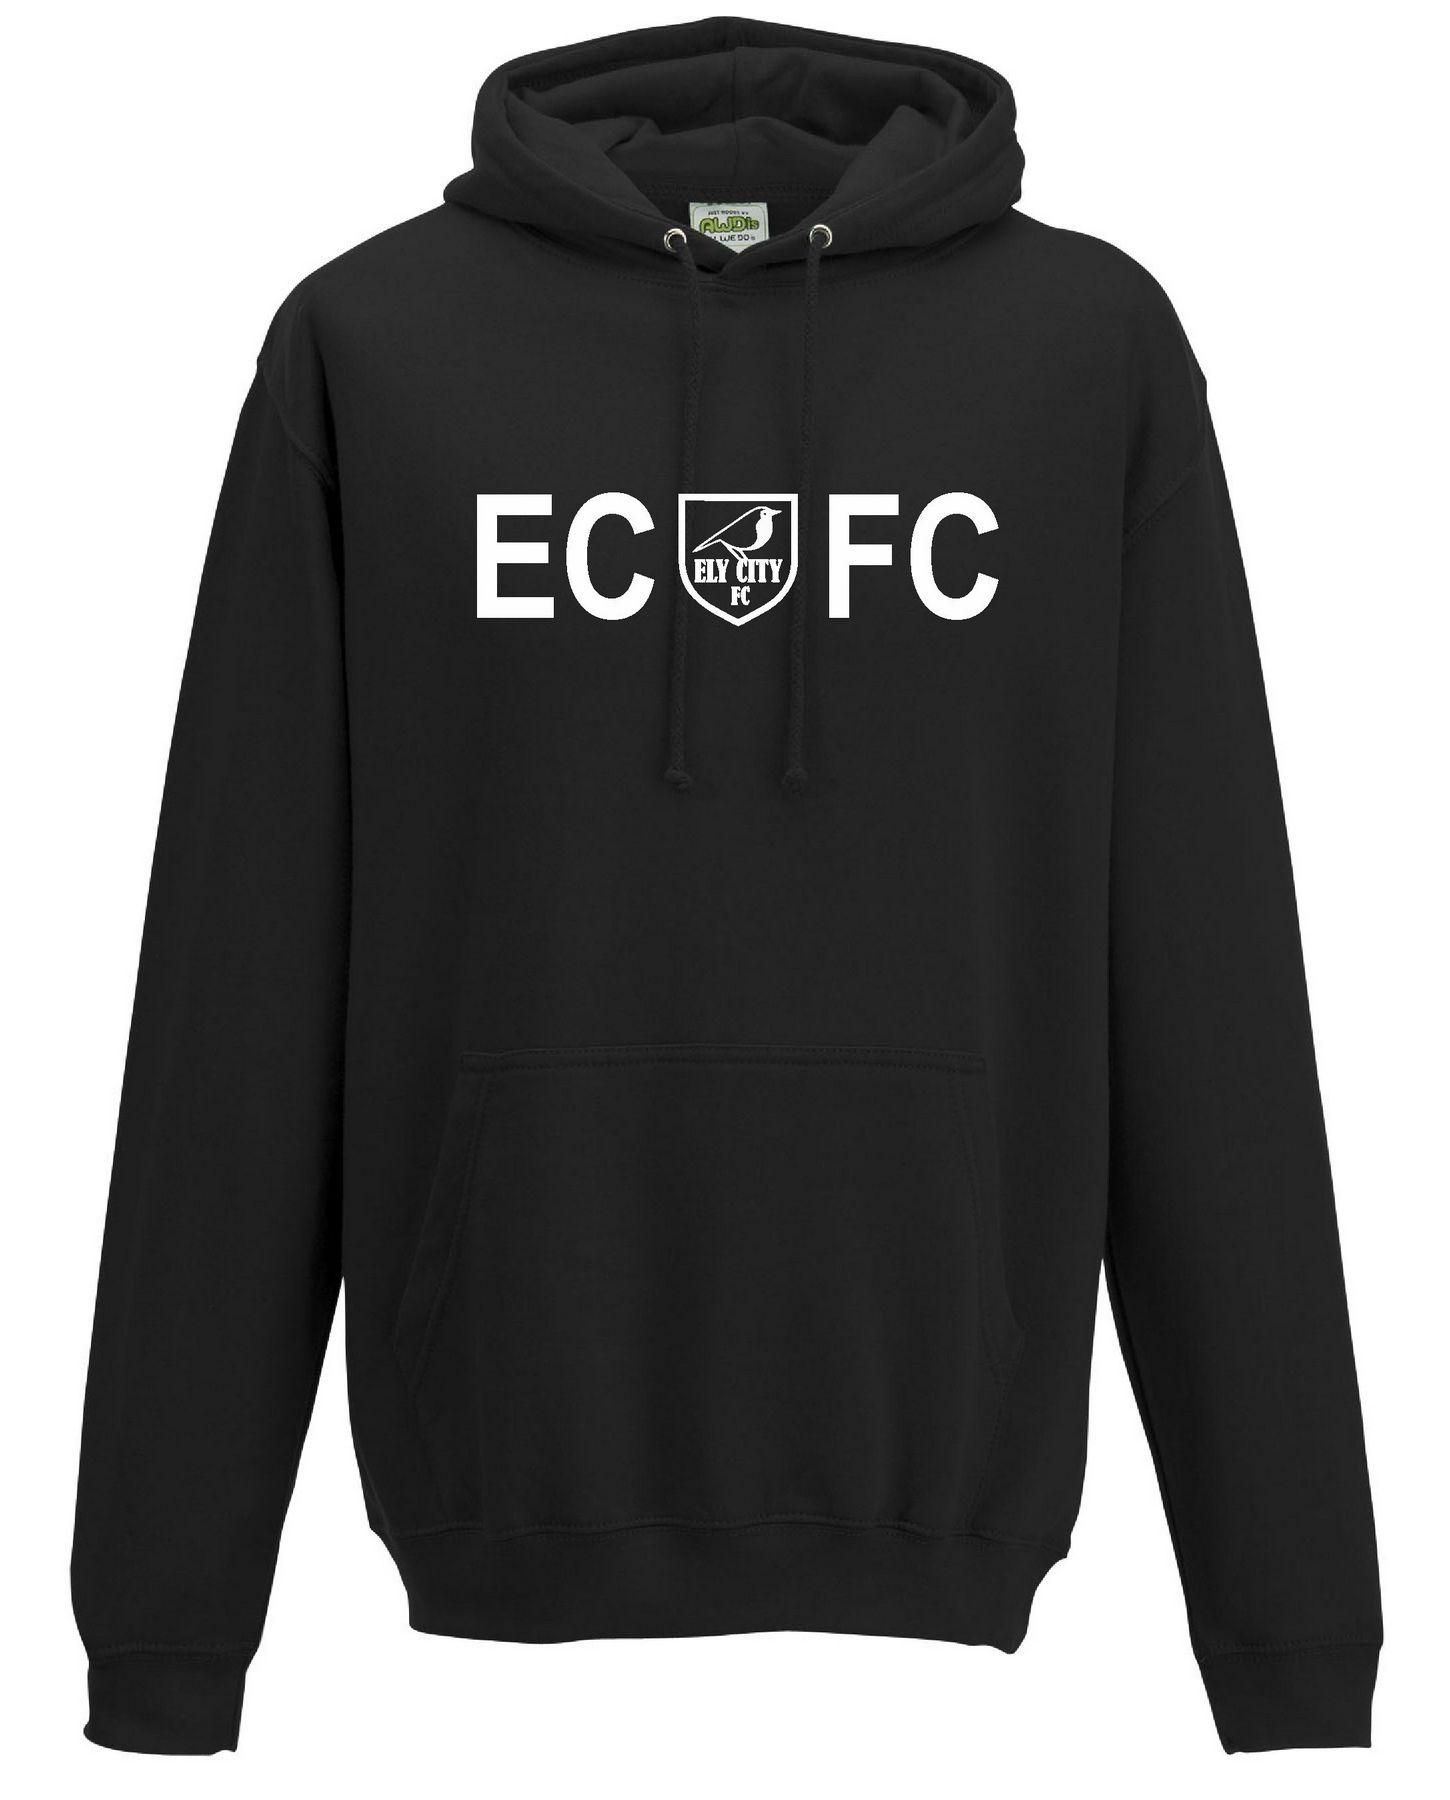 ECFC – Classic Hoodie in Black